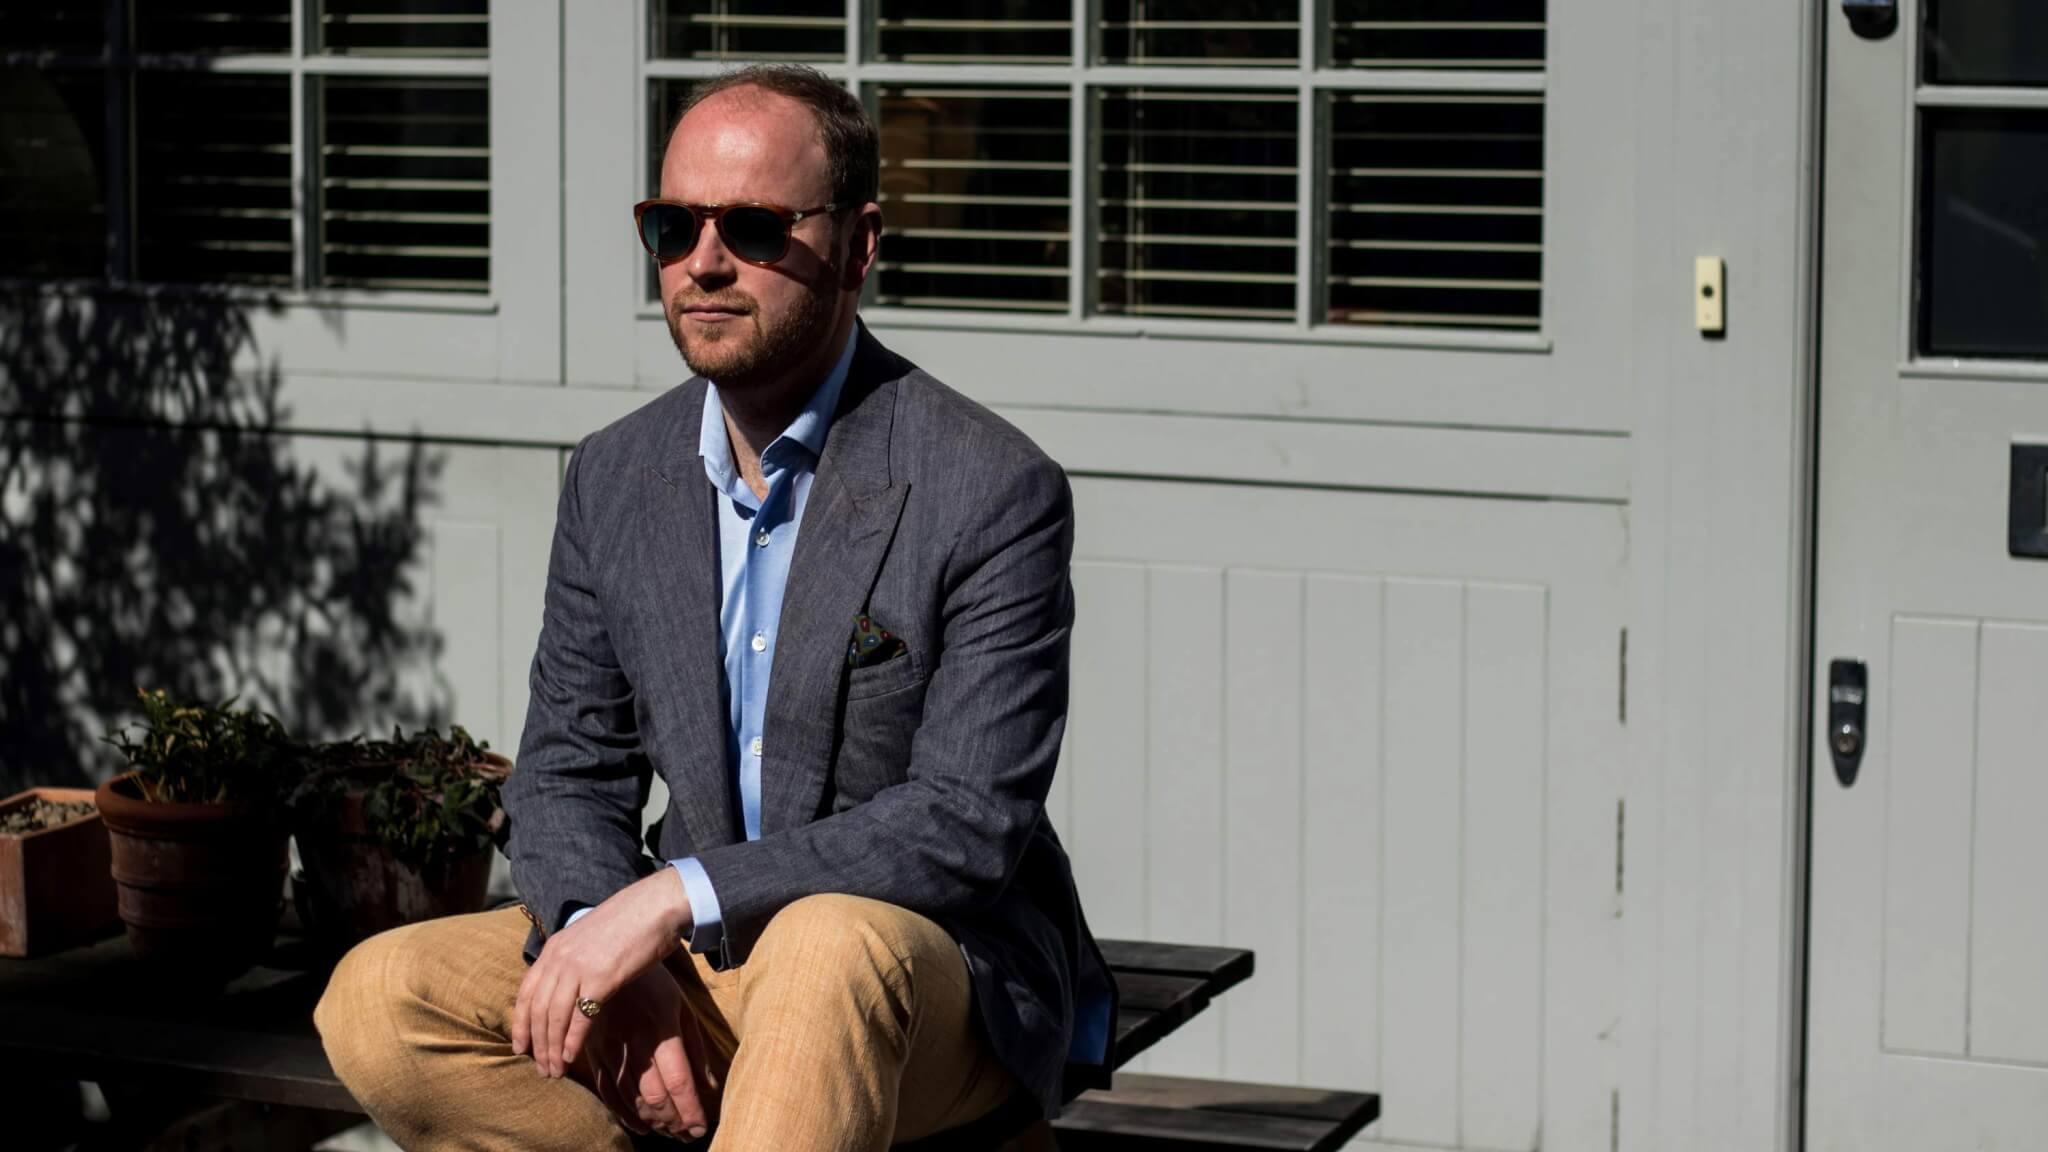 bespoke-casualwear-savile-row